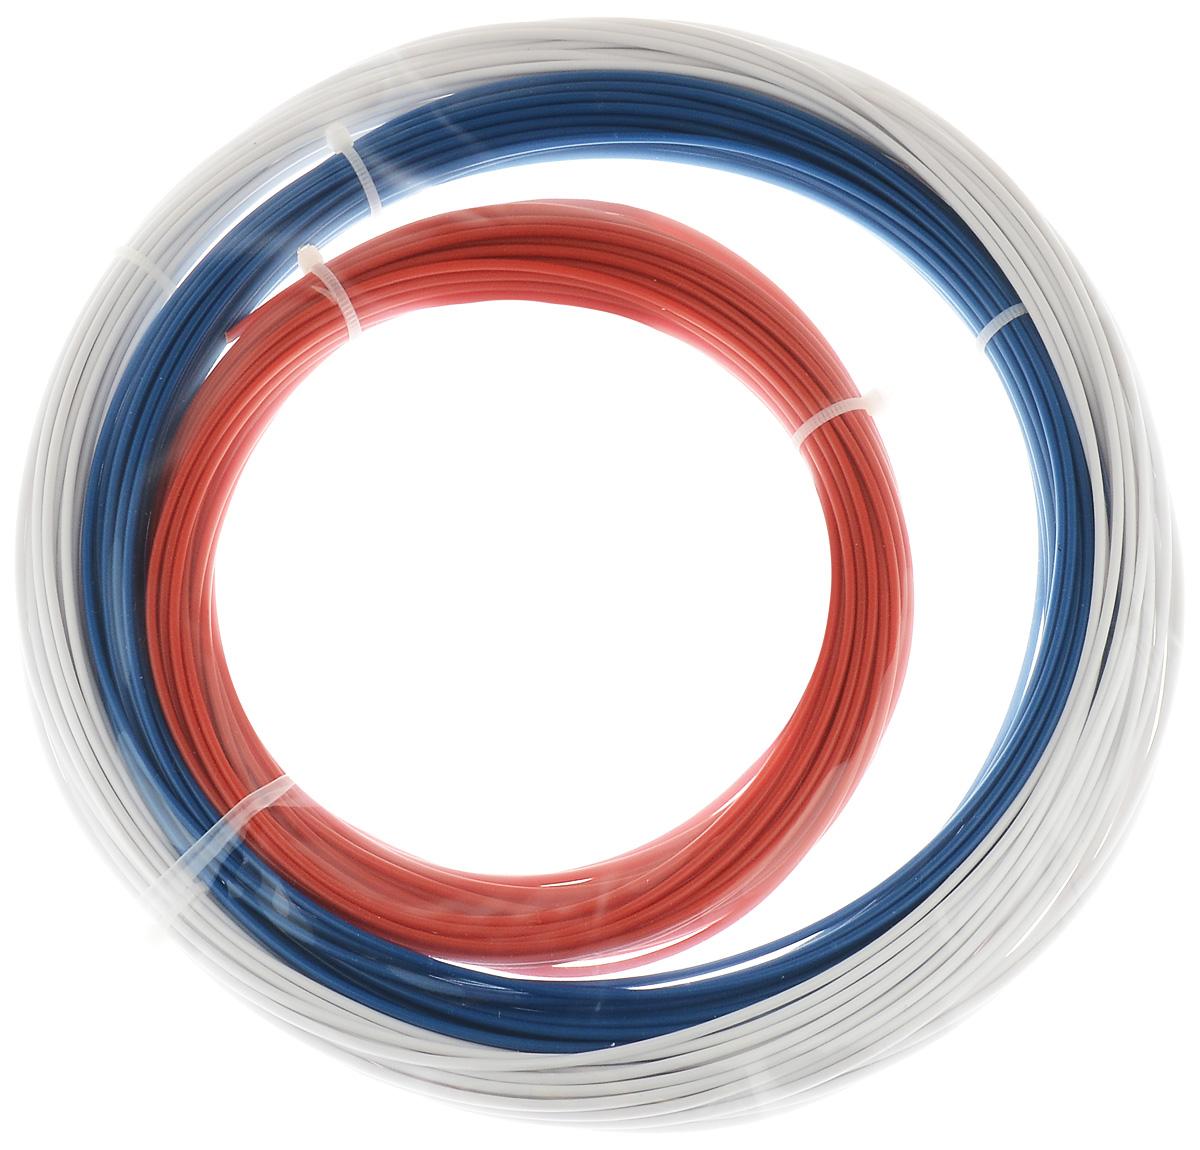 ESUN 3D Filament, Red White Blue комплект ABS-пластика, 10 мУТ000006724ESUN 3D Filament - комплект ABS-пластика для 3D печати, состоящий из трех цветов. Толщина пластика составляет 1,75 мм. Длина каждого мотка - 10 метров.